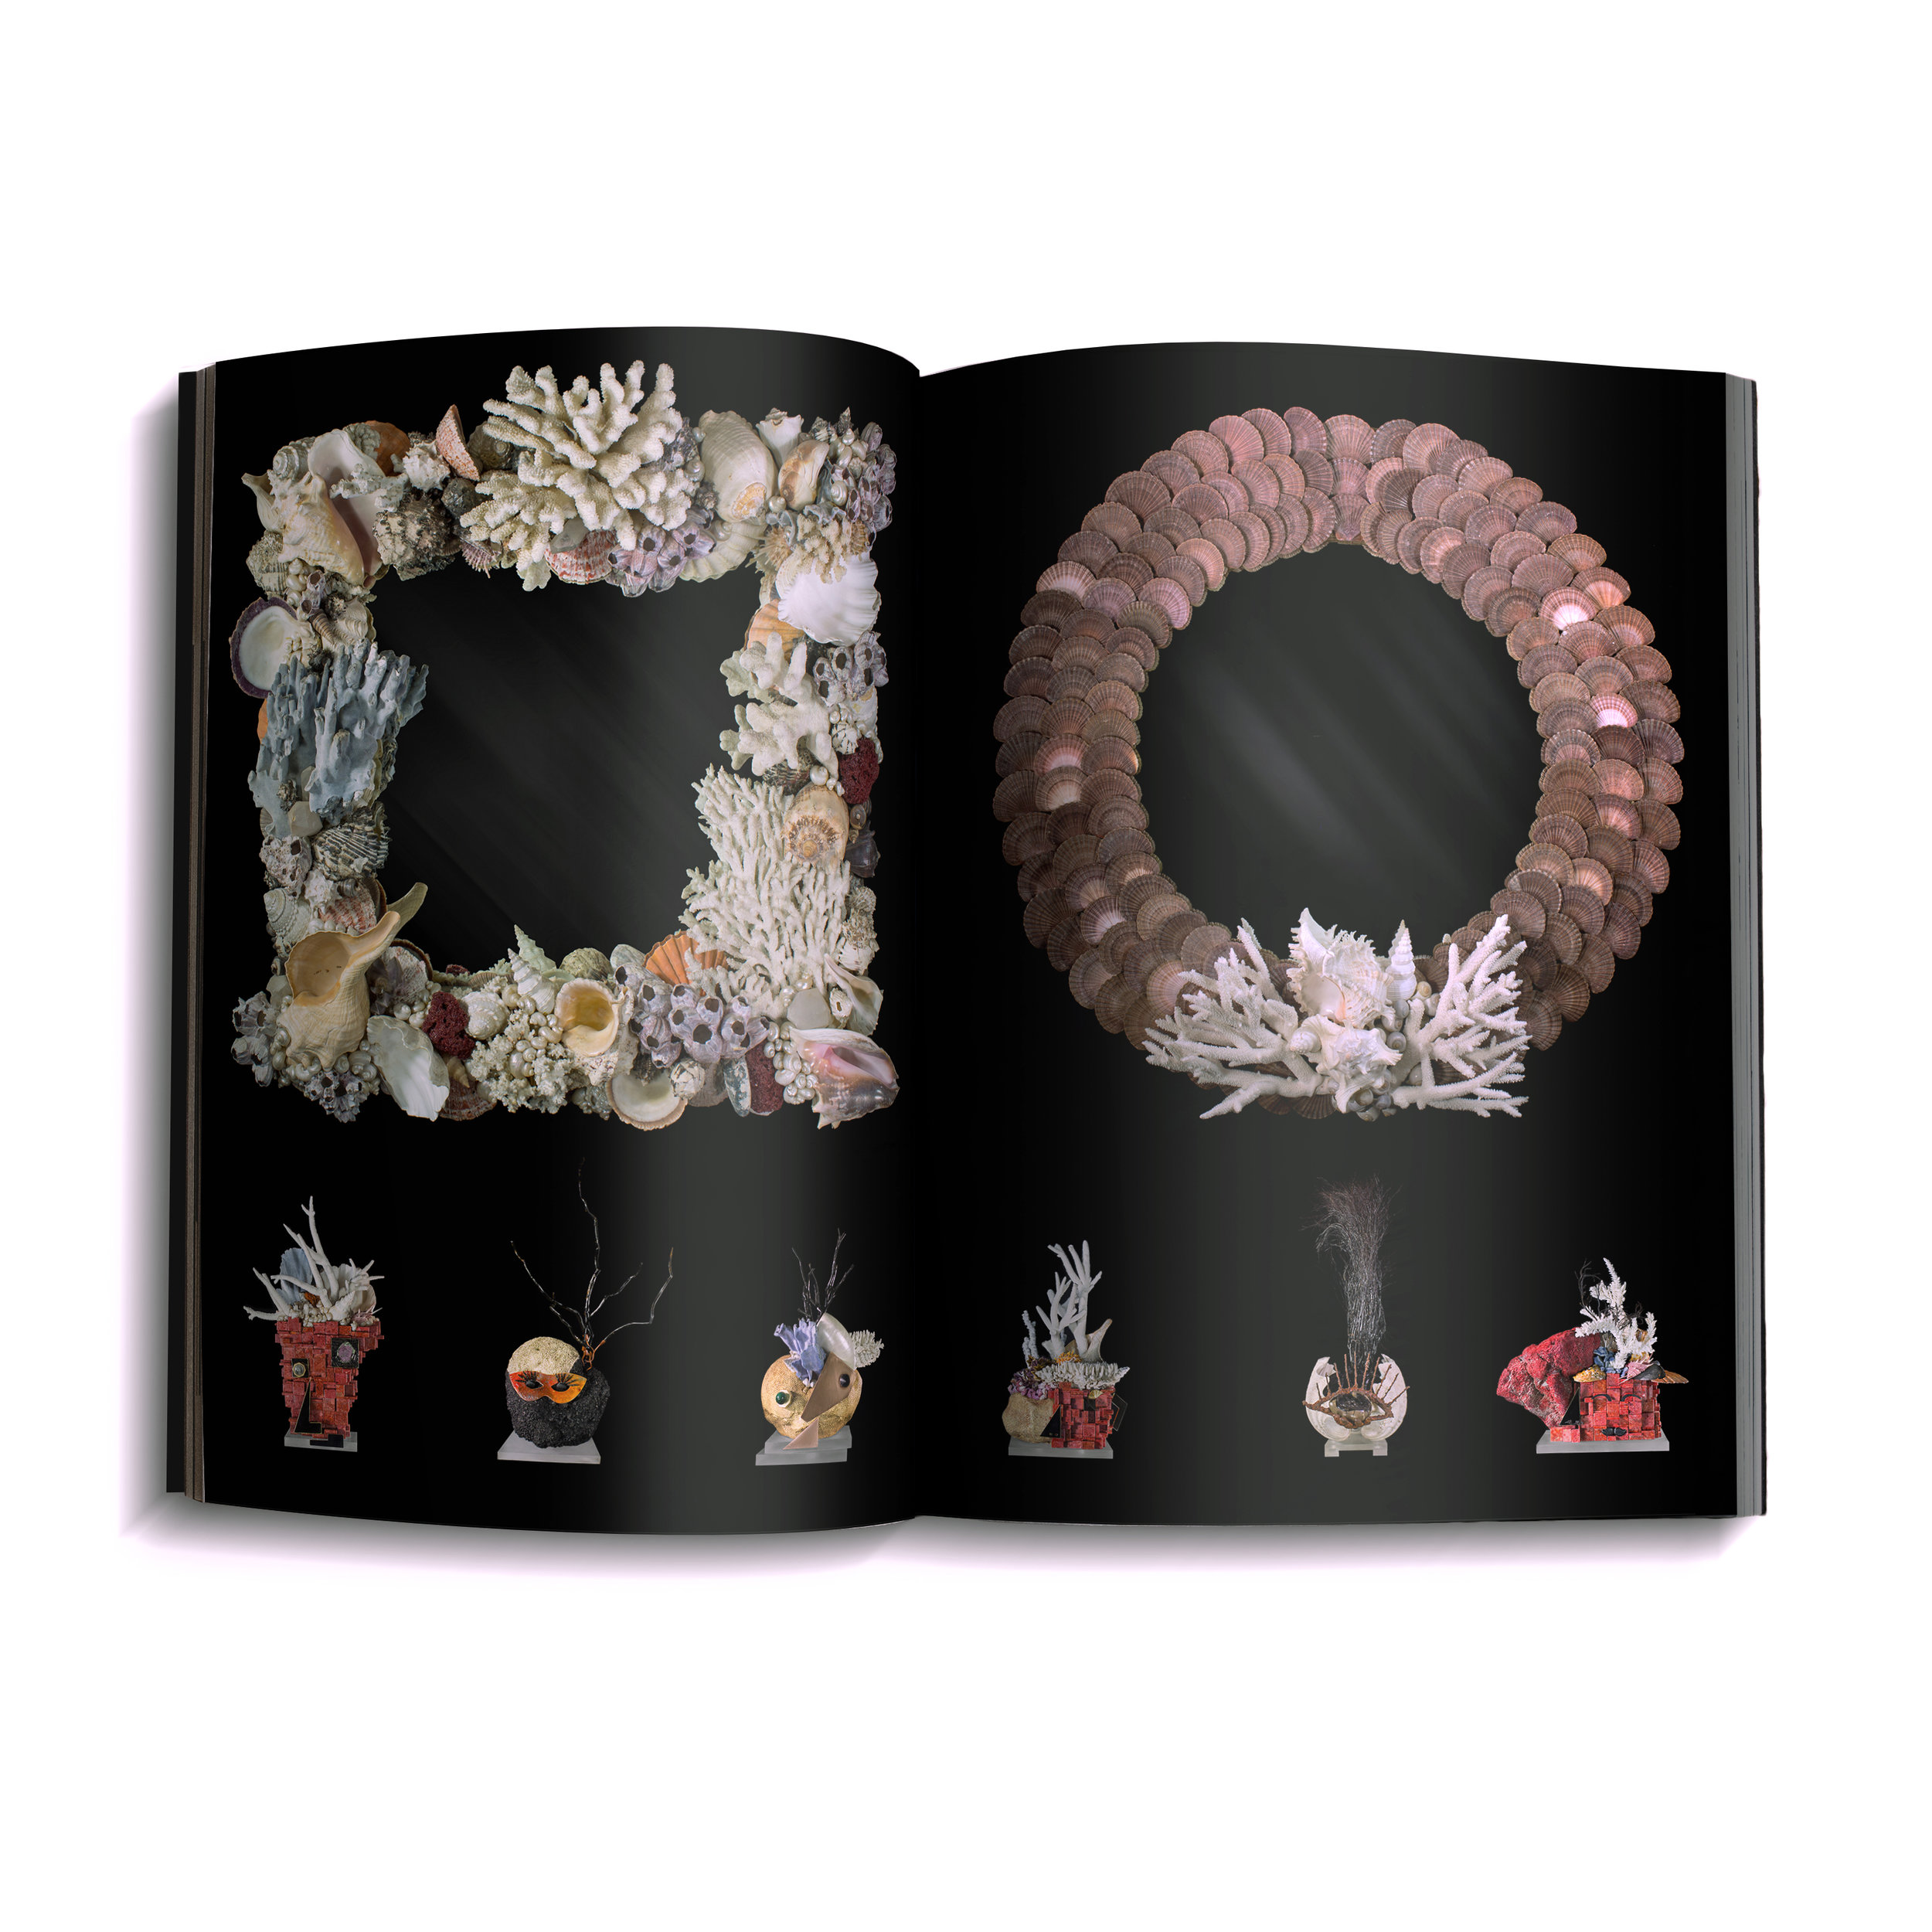 vahan-zhamkochyan-magazine-1.jpg